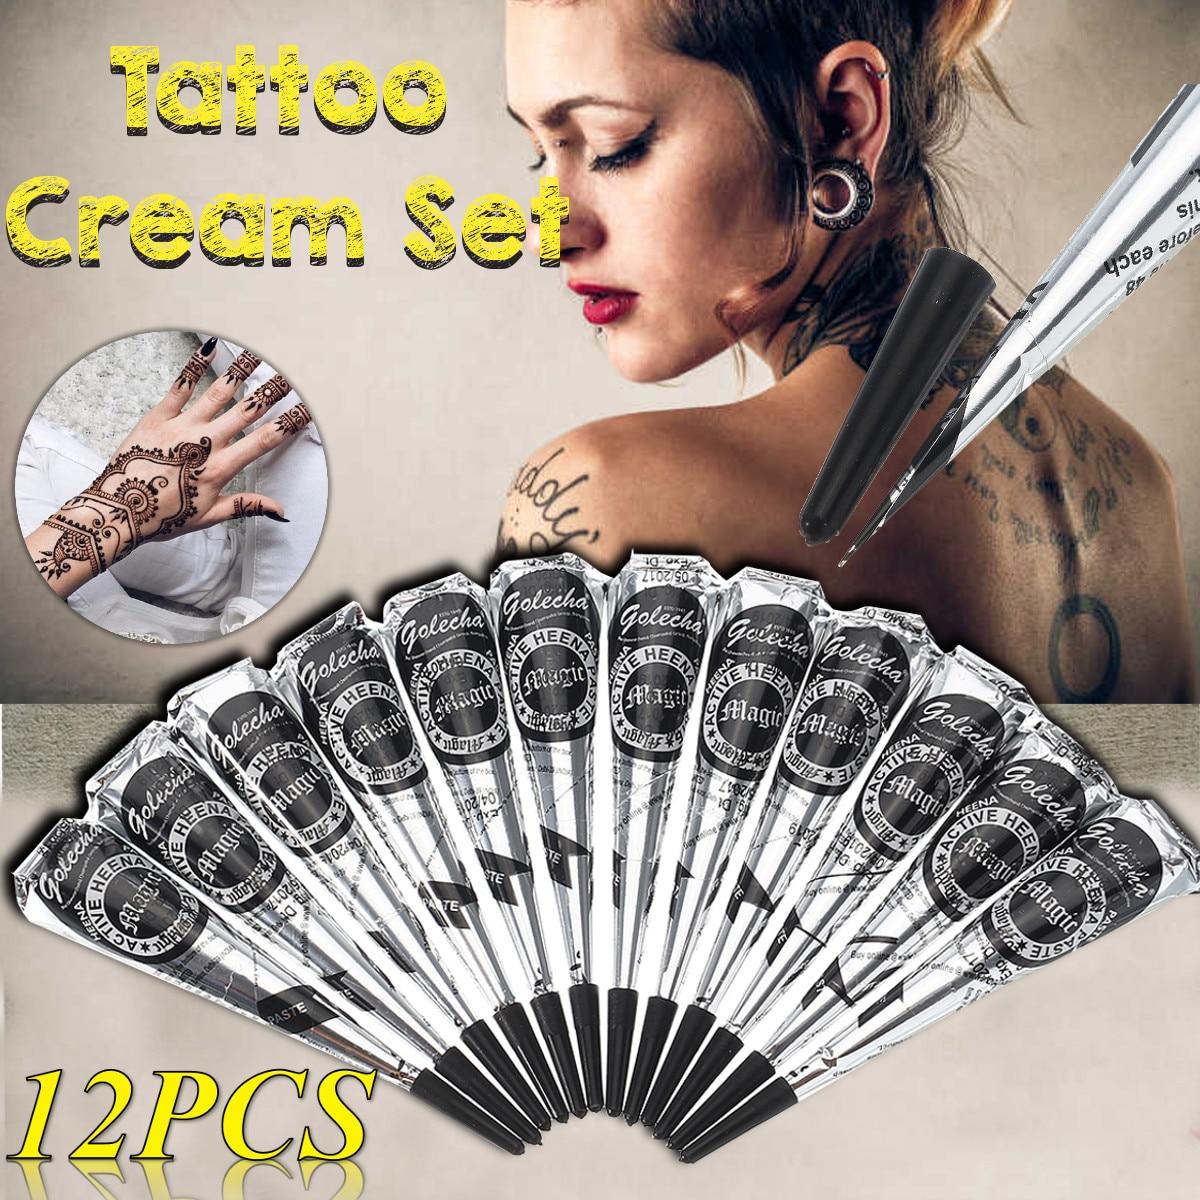 12Pcs 25g Natural Mehndi Henna Cones Indian Henna Tattoo Paste For Temporary Tattoo Sticker Mehndi Makeup Body Paint